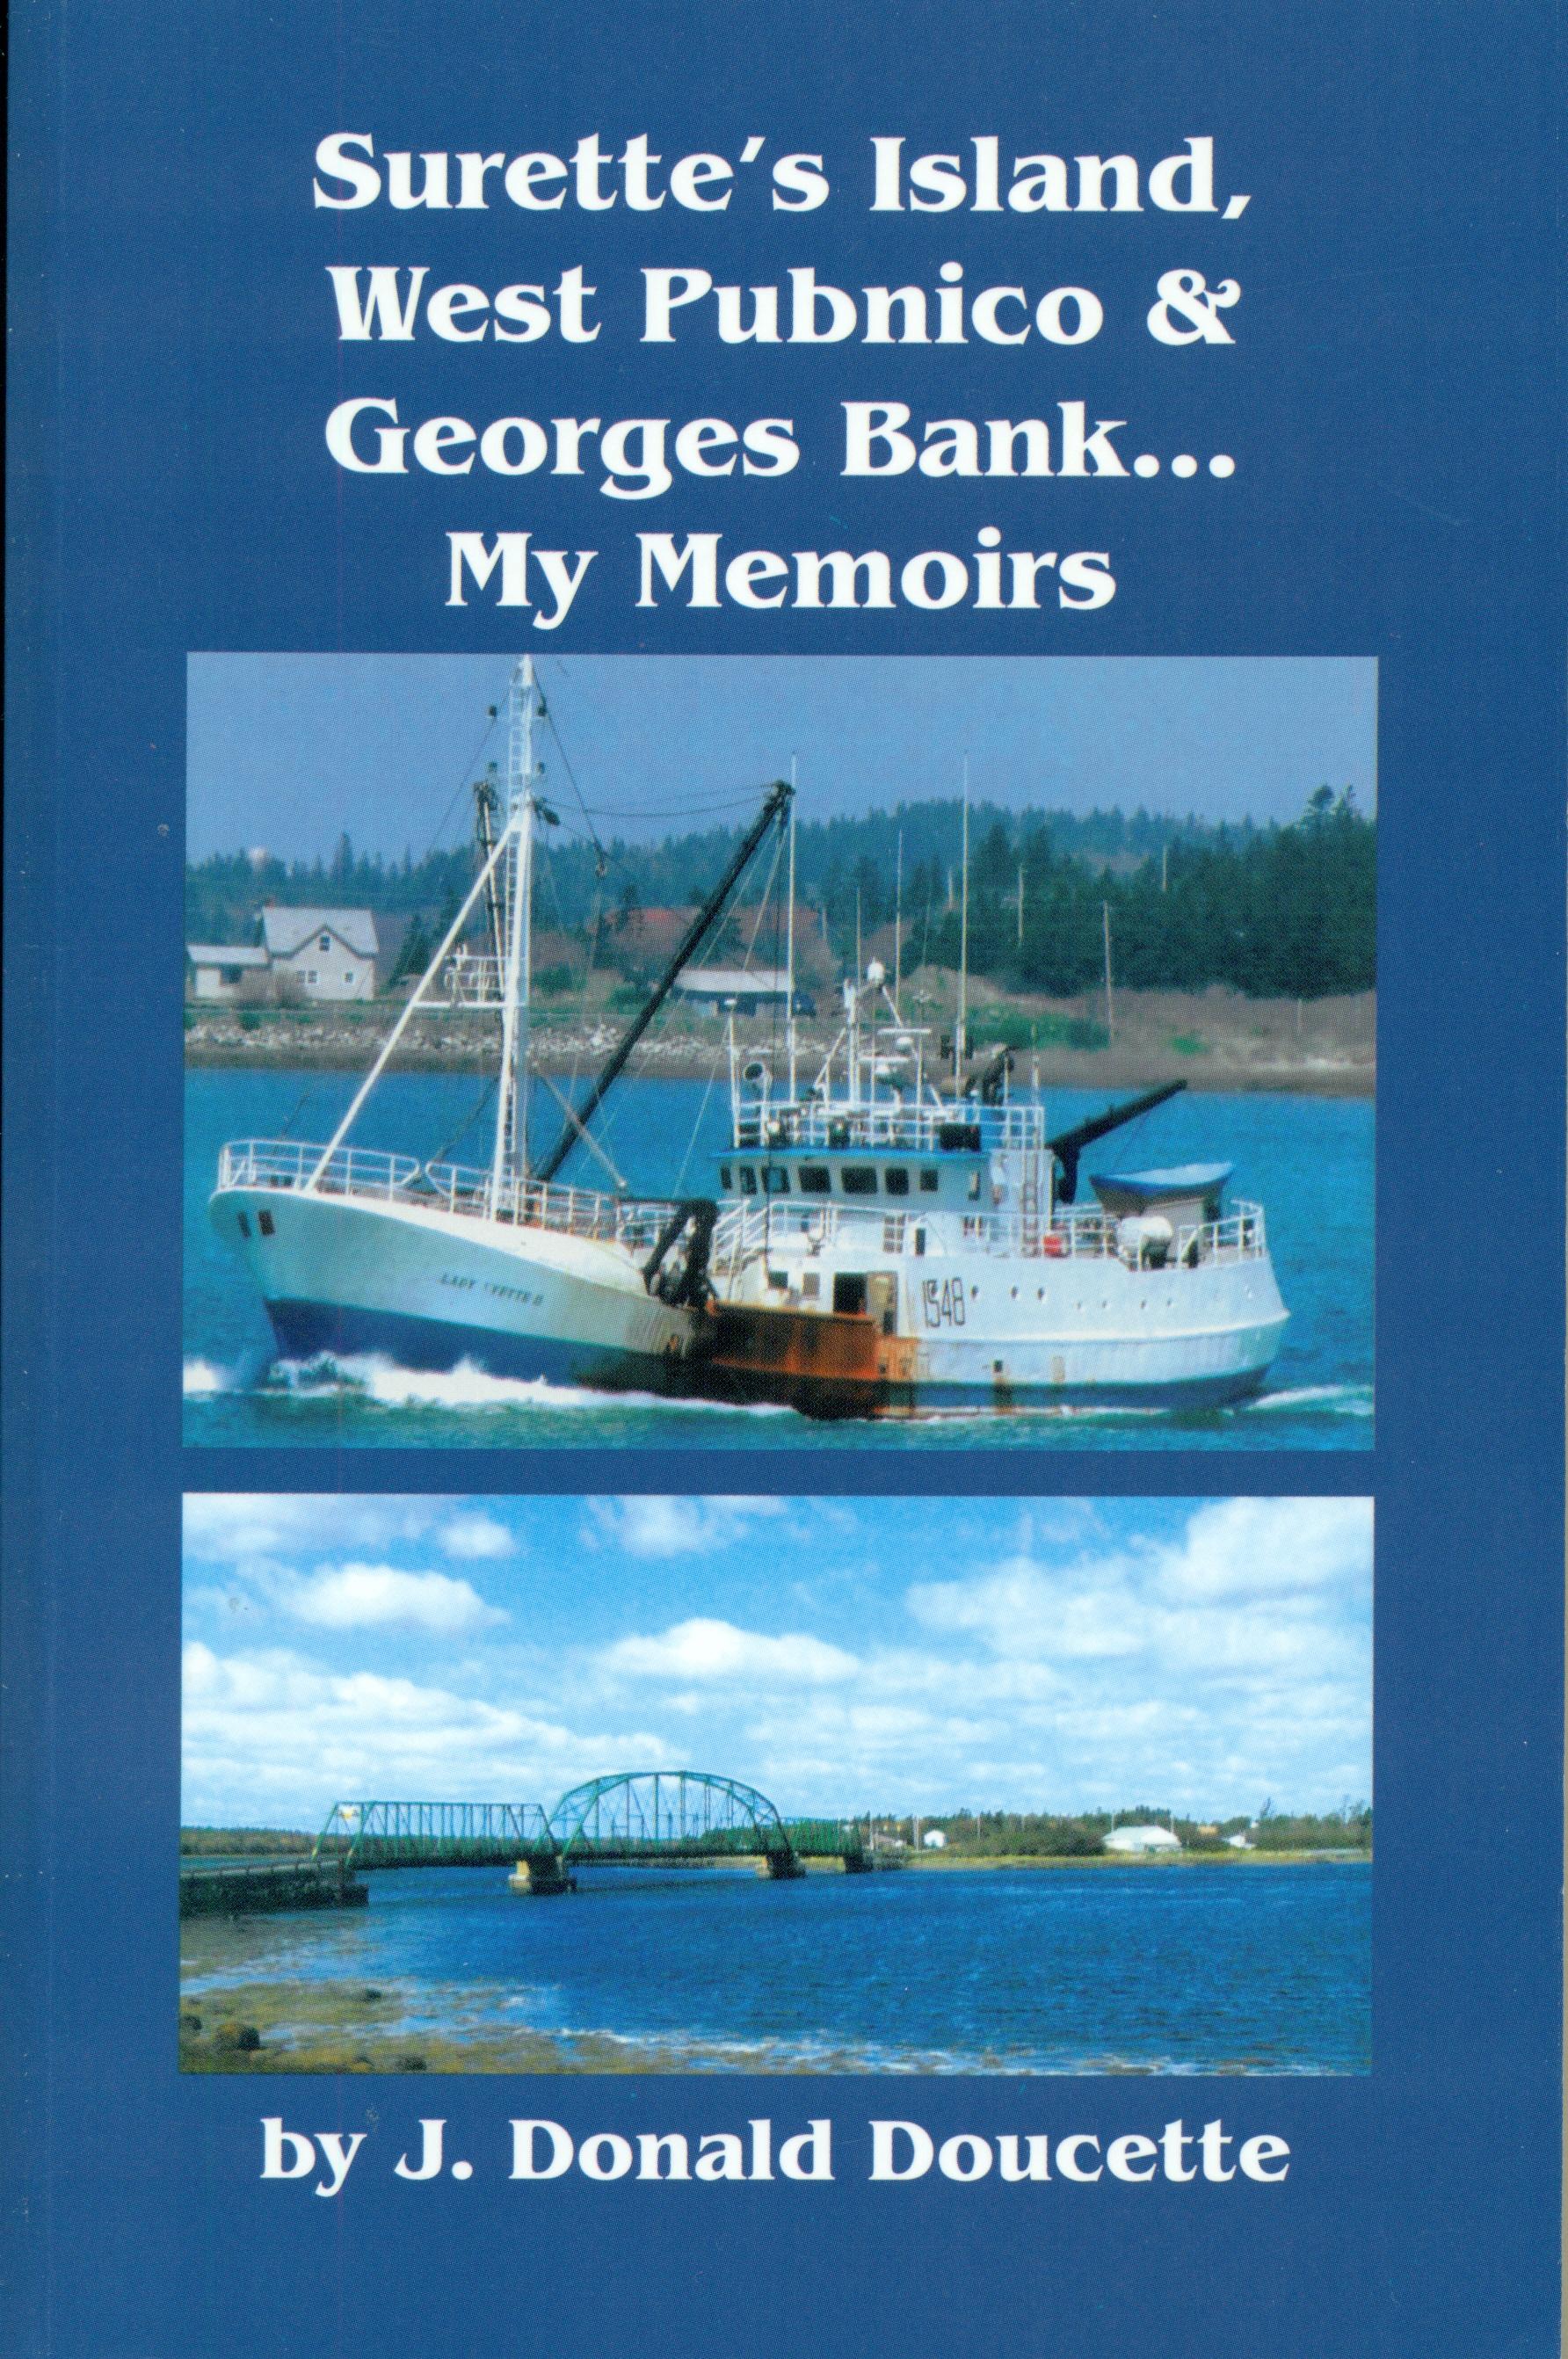 Surette's Isl., W. Pubnico & Georges Bank Memoirs